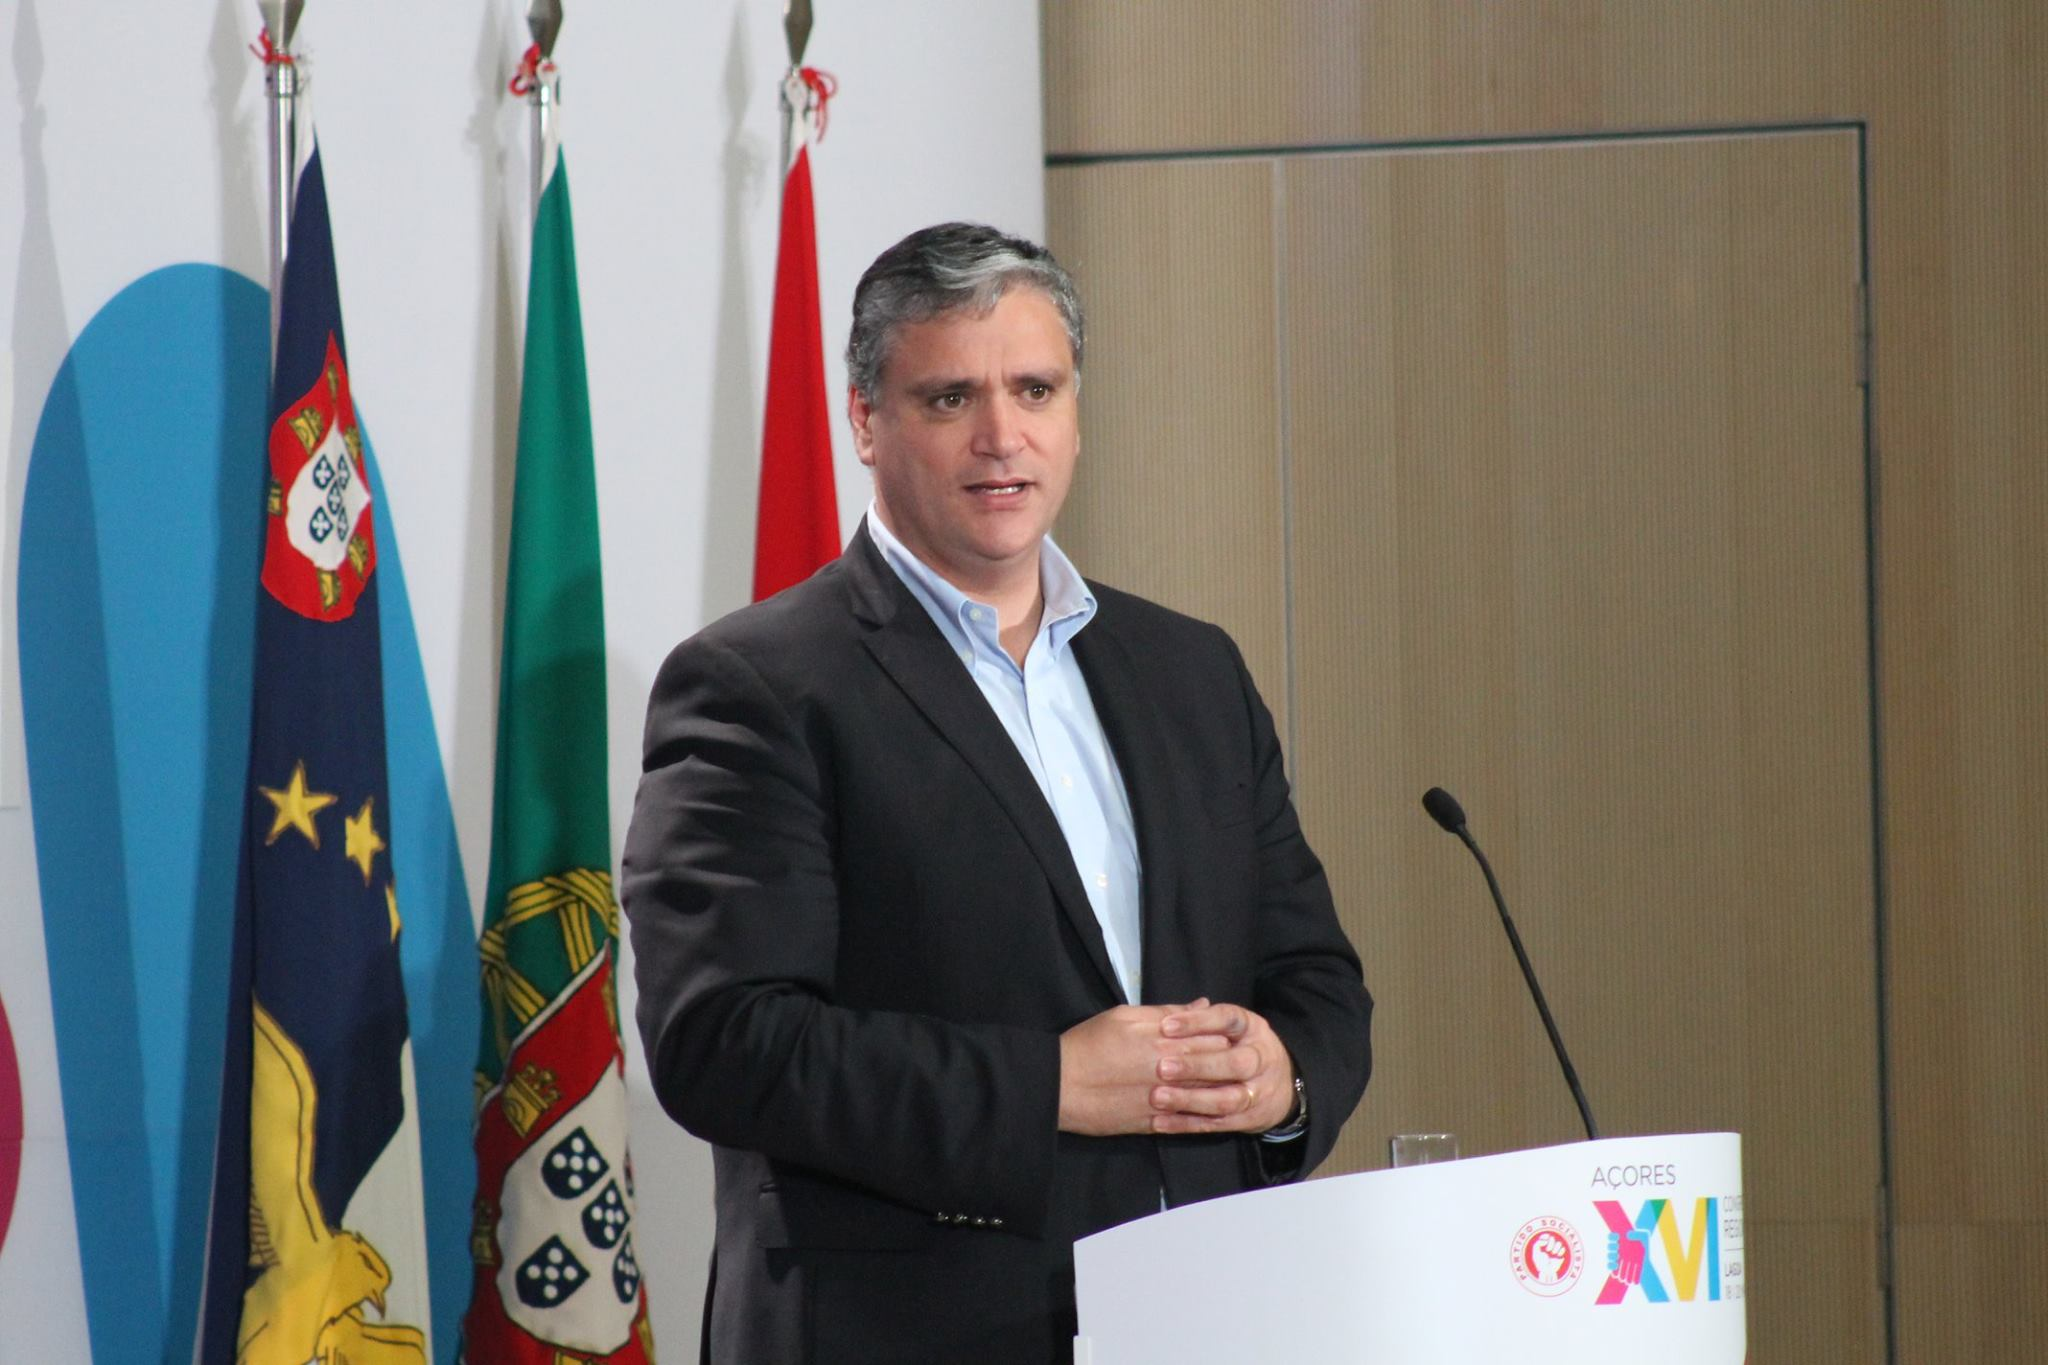 PS/Açores adota modelo de listas abertas, anunciou Vasco Cordeiro